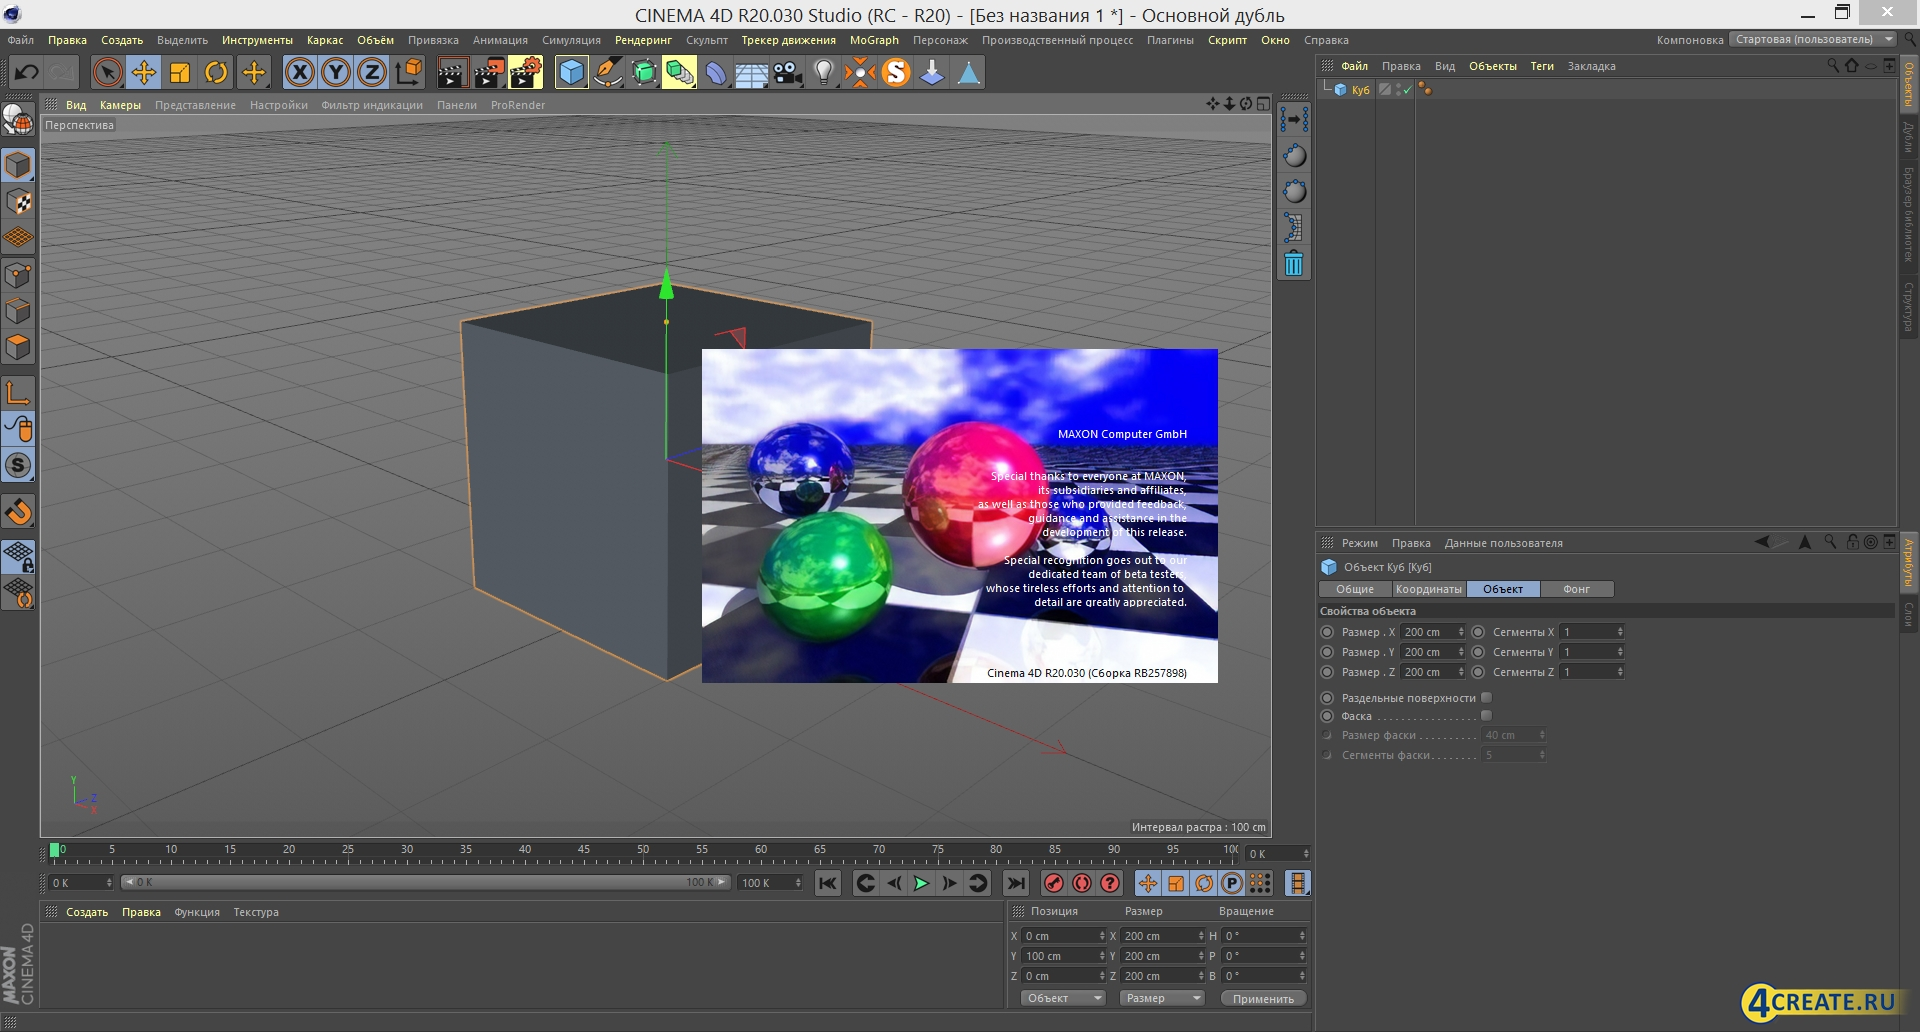 CINEMA 4D Studio R20.030 (Скриншот 1)